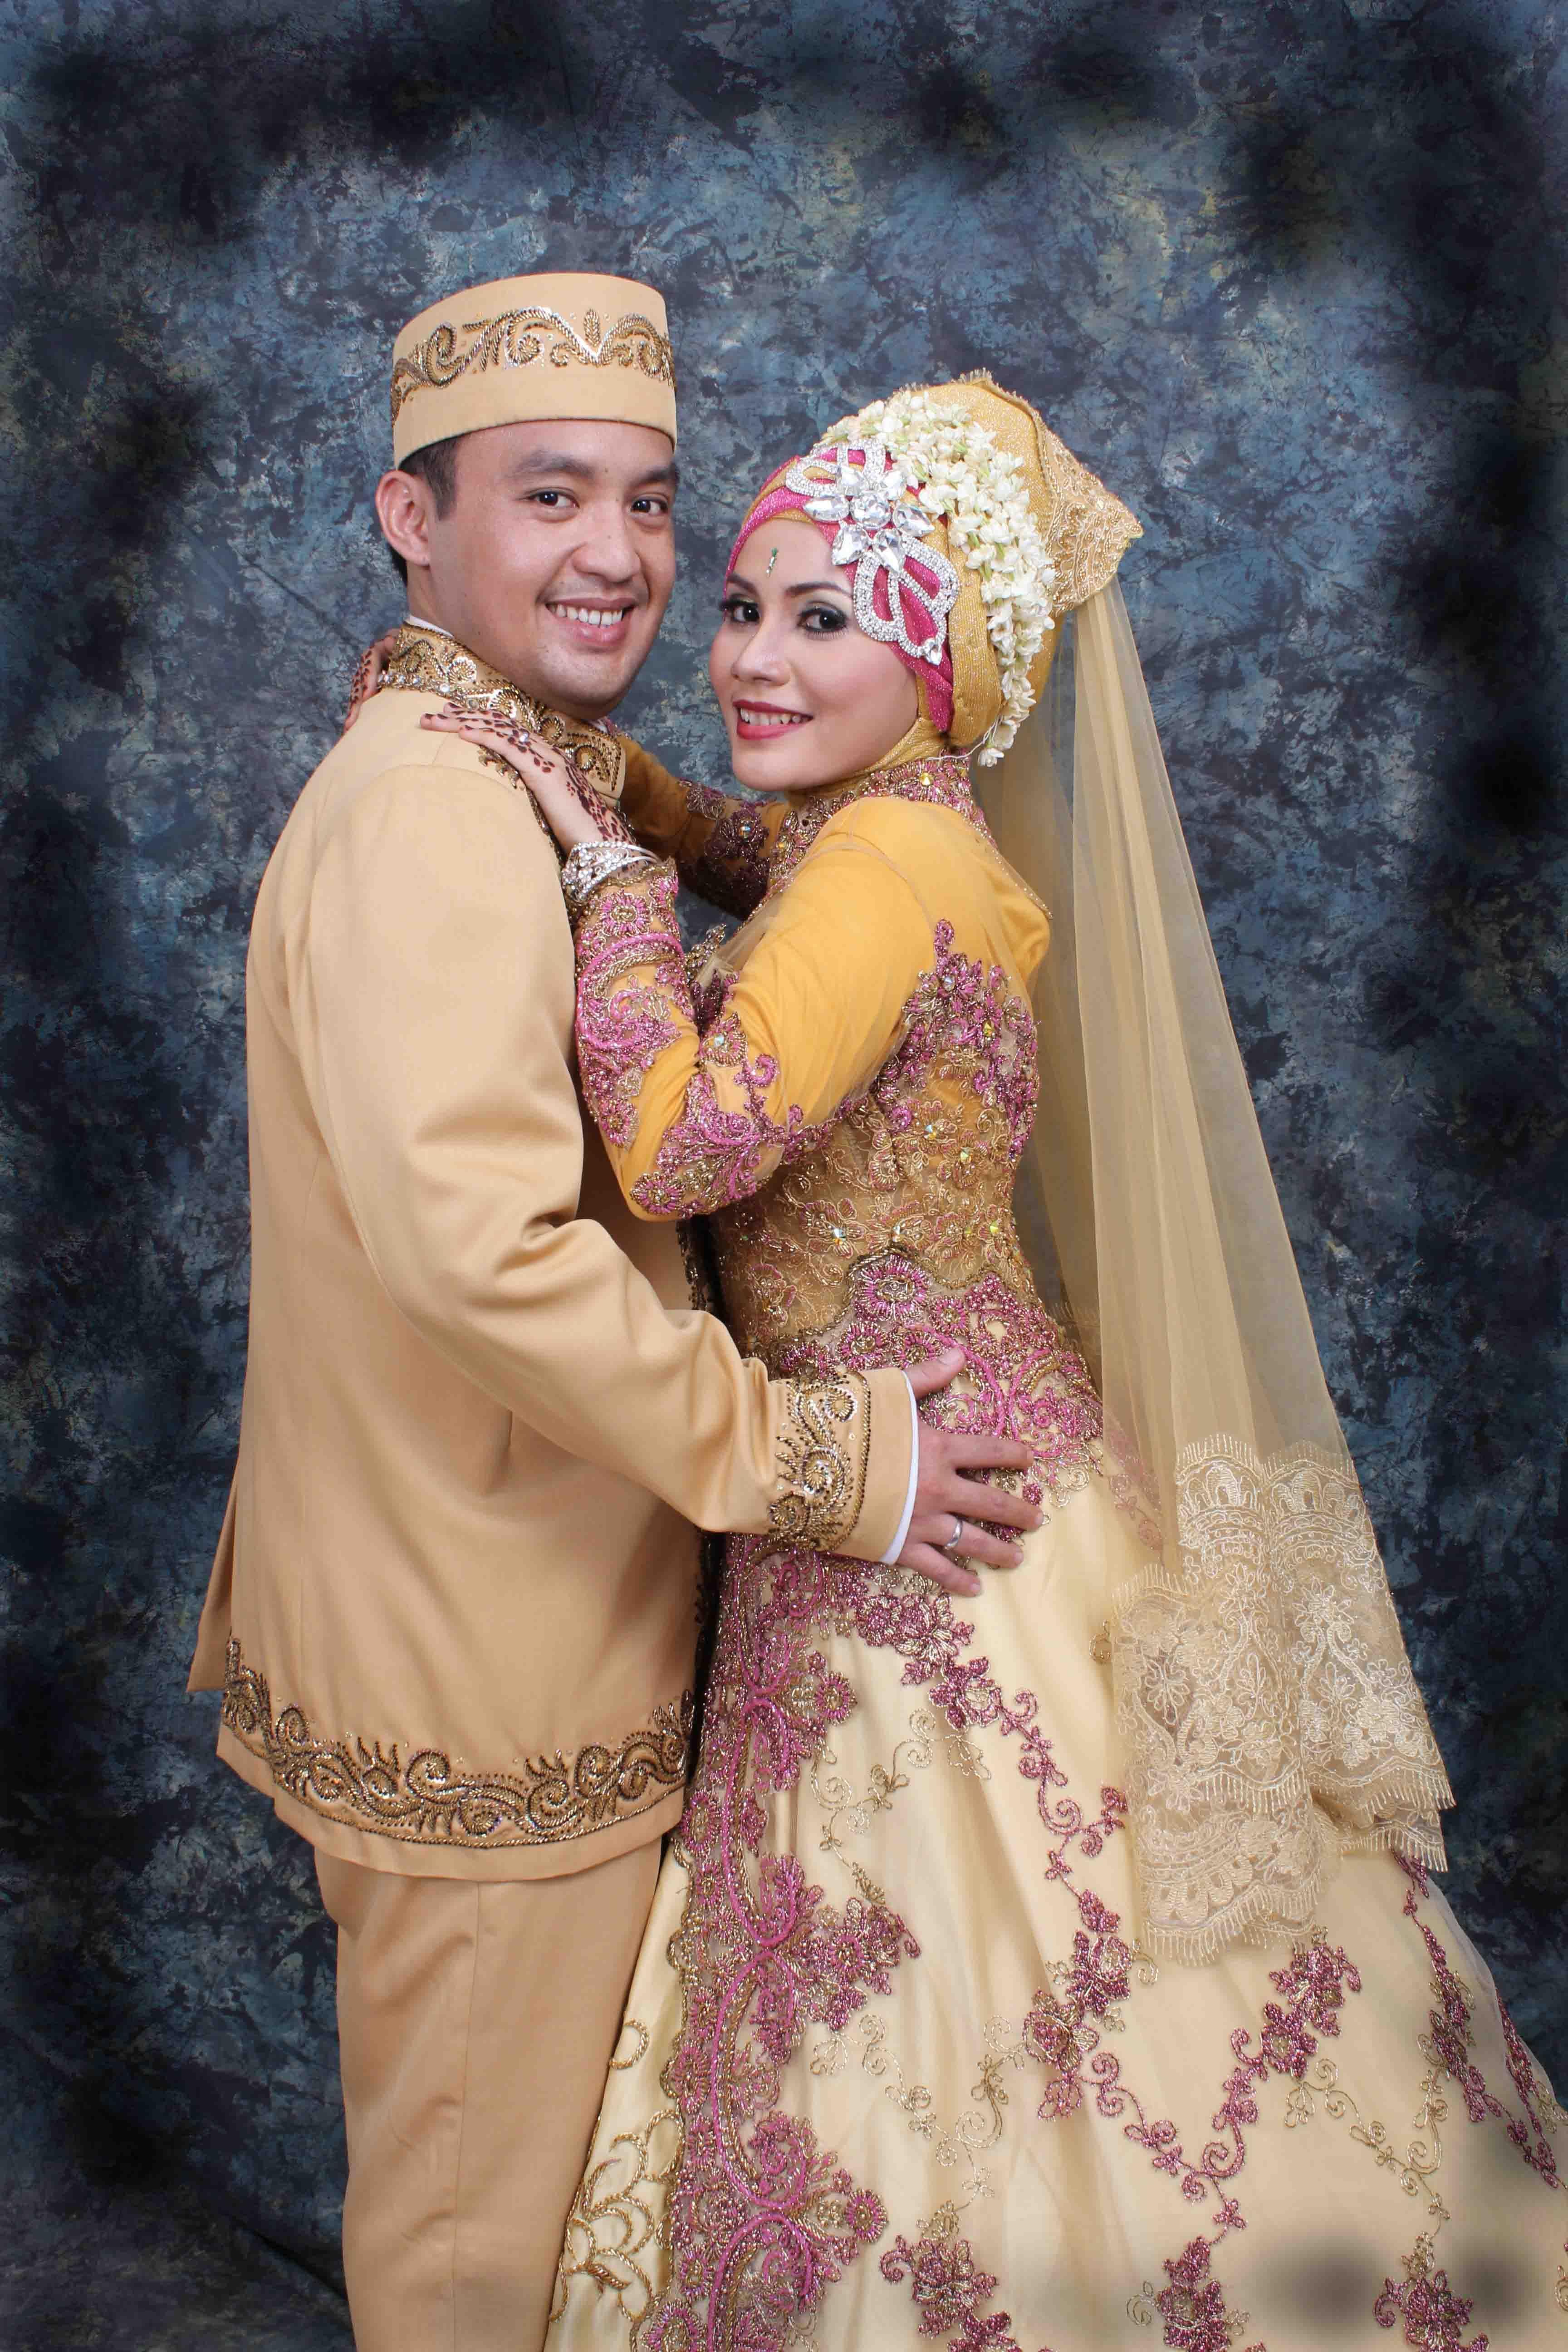 gaun pengantin muslim modifikasi  Pengantin, Gaya pengantin